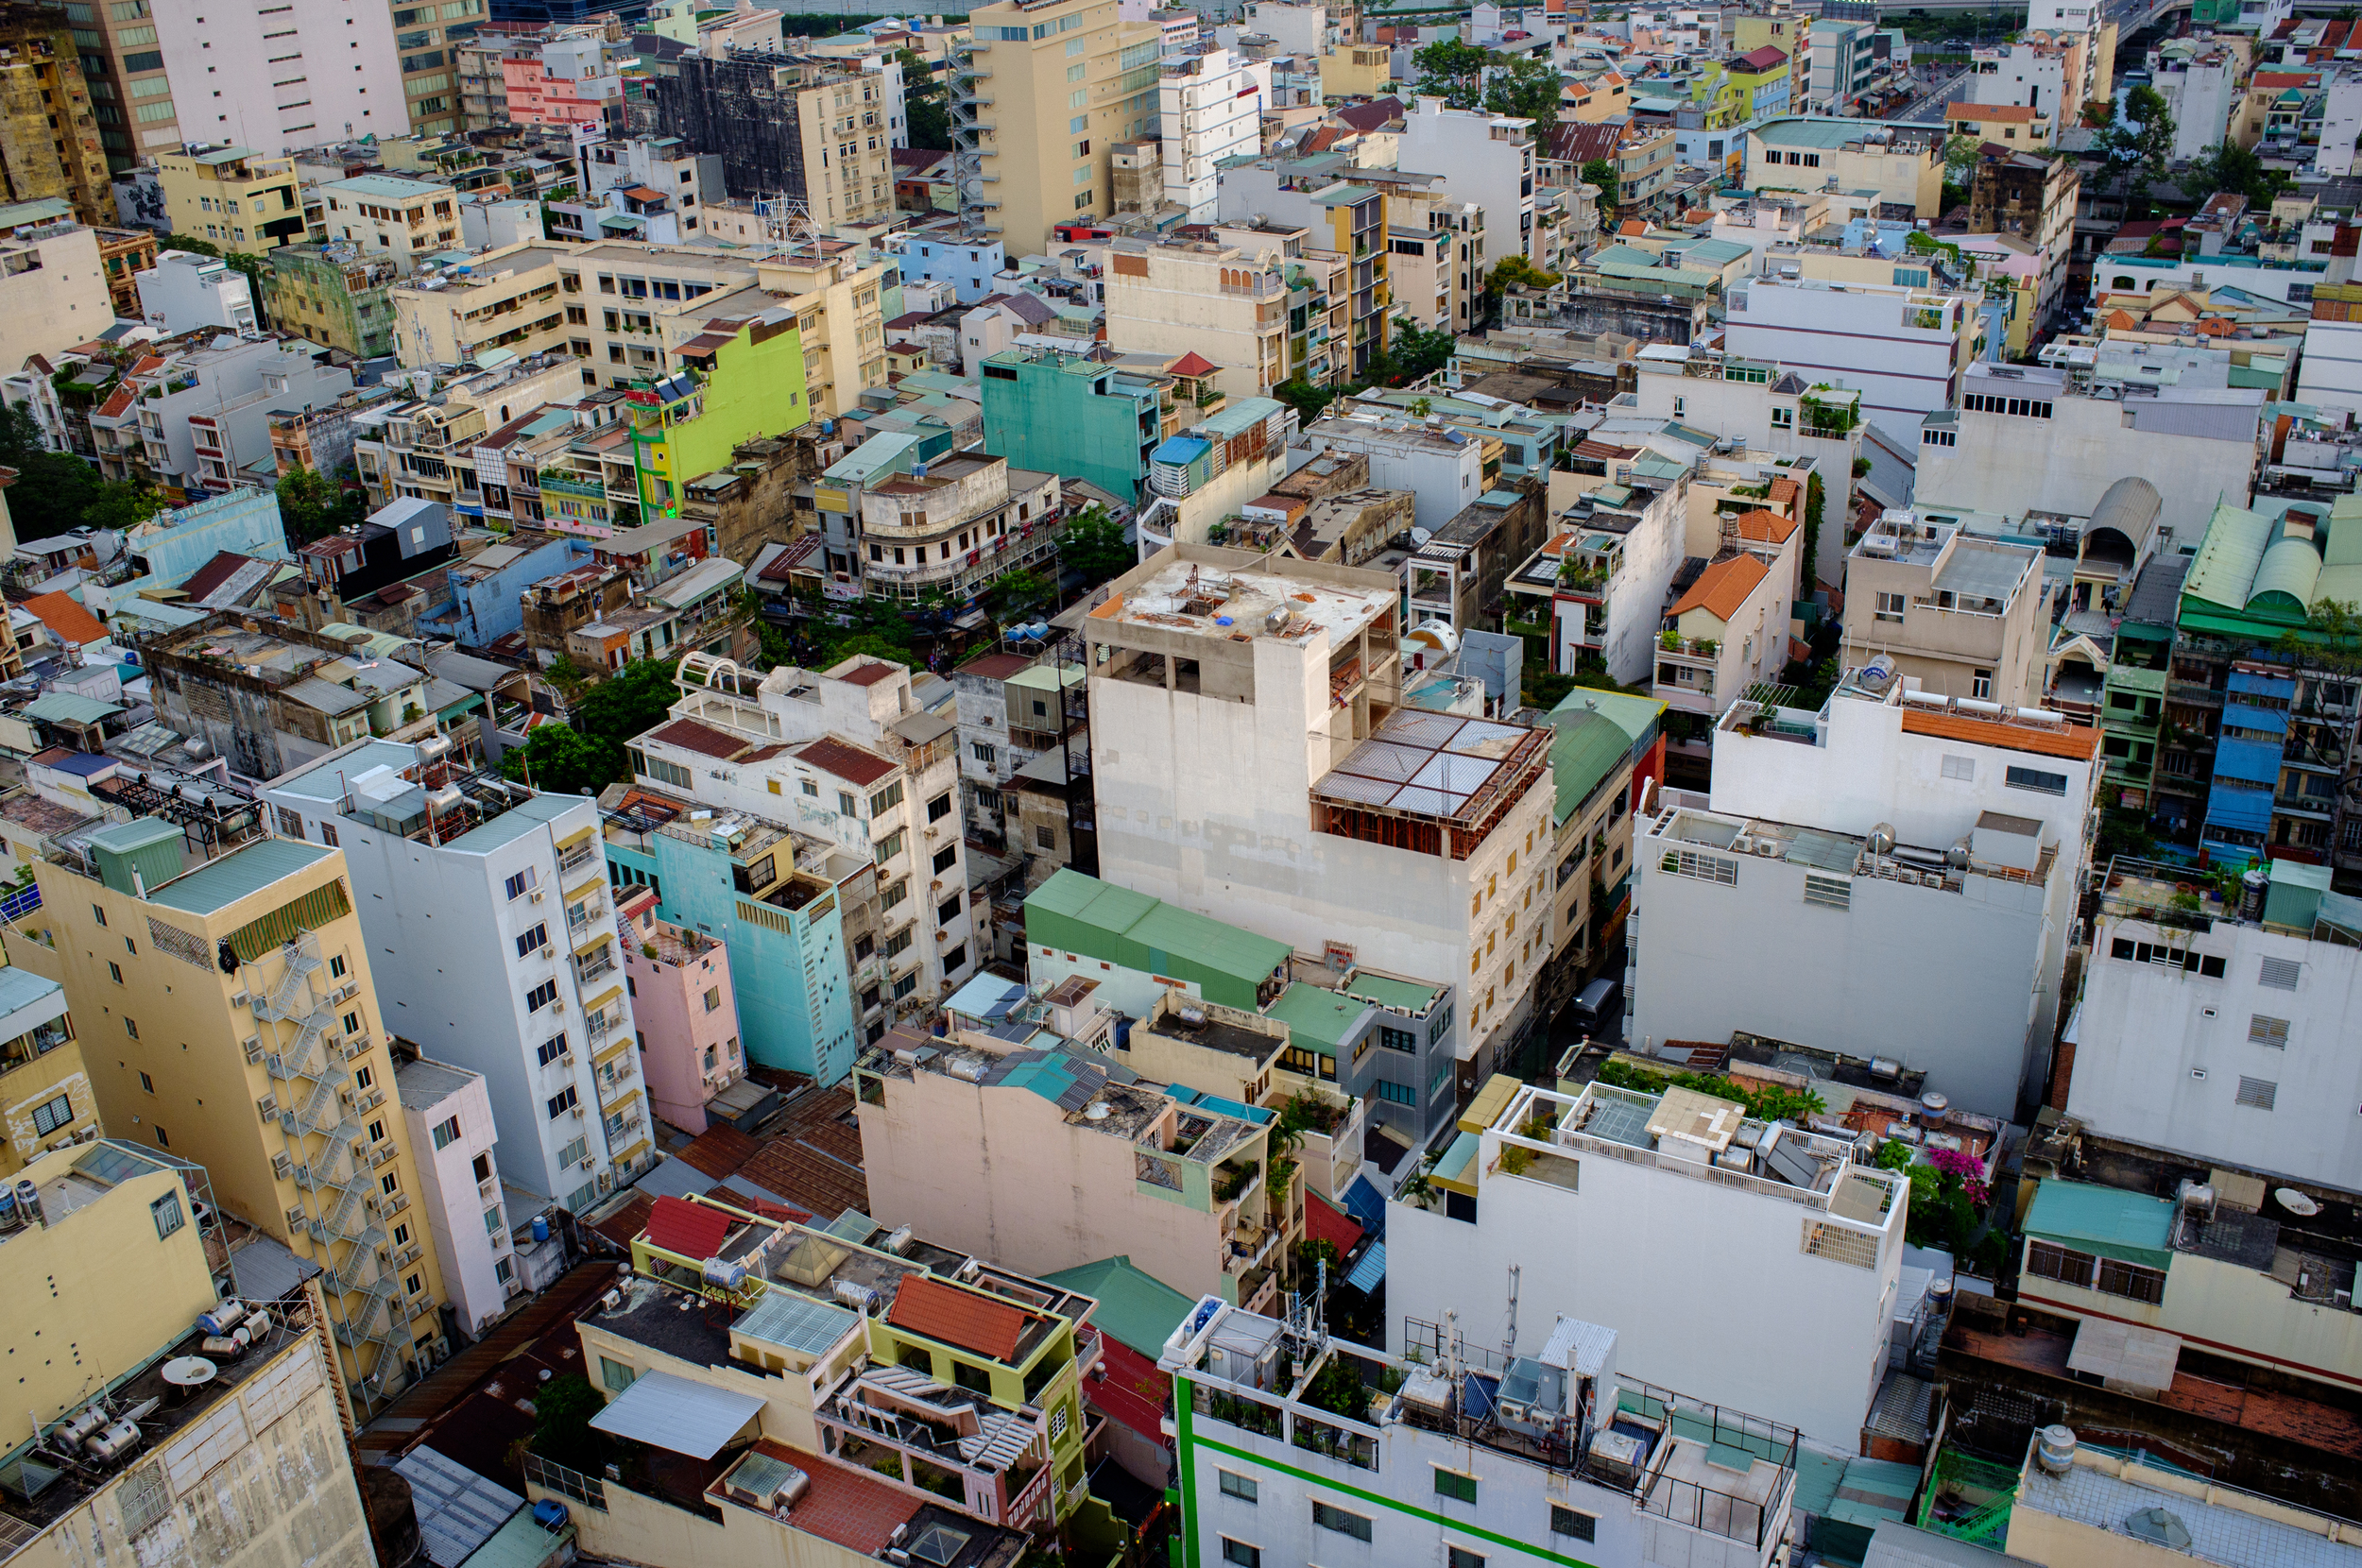 Saigon: so dense, you can barely see the streets